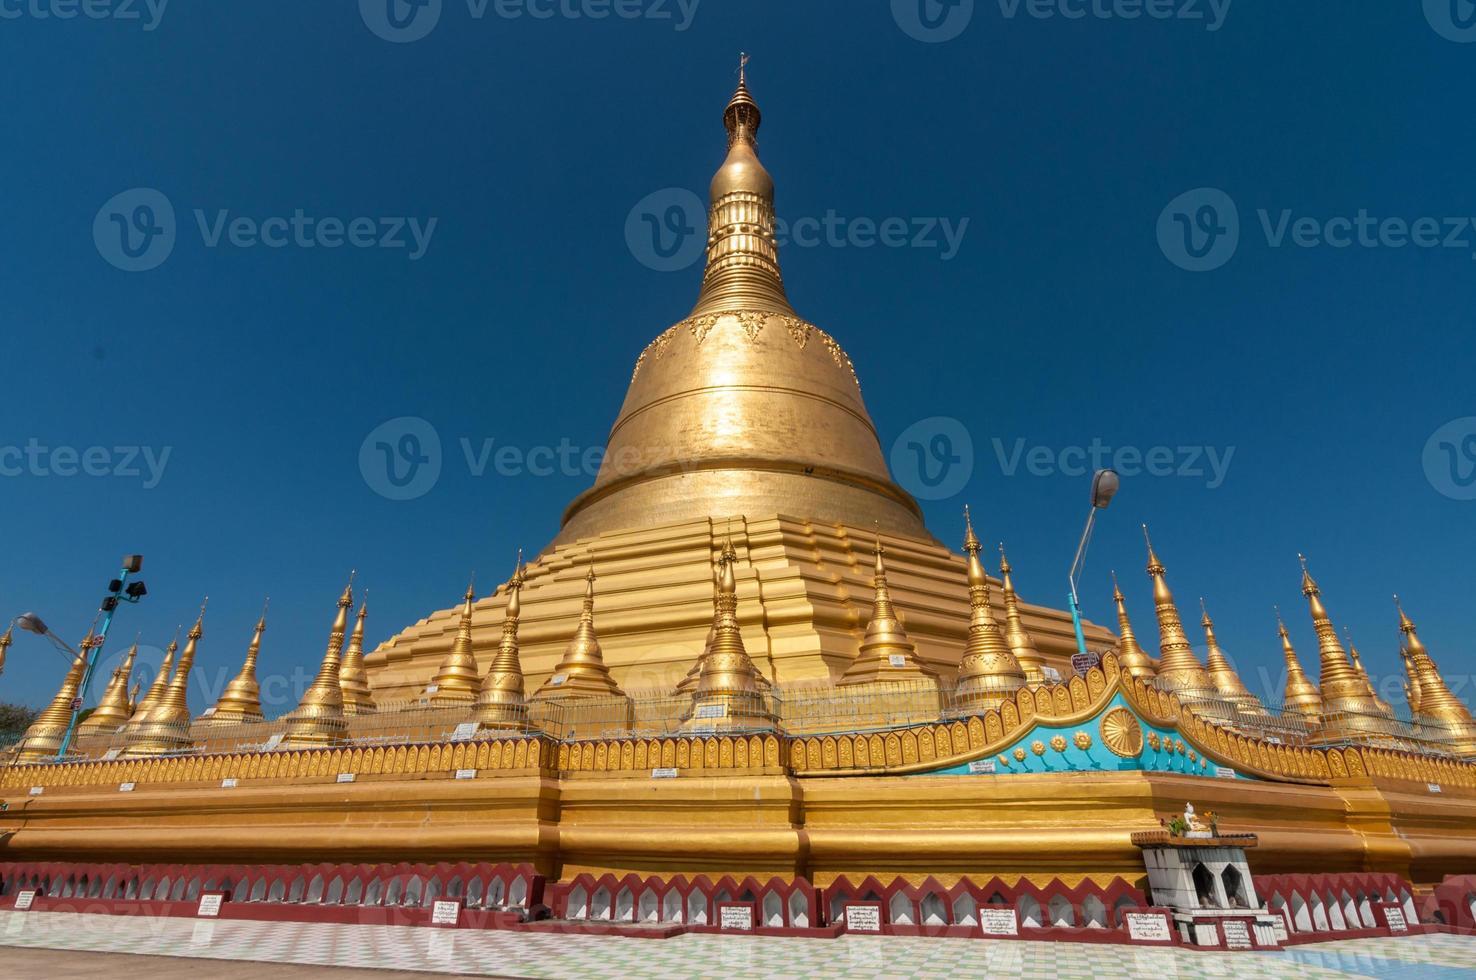 bago, myanmar-21 février 2014: pagode shwemawdaw photo